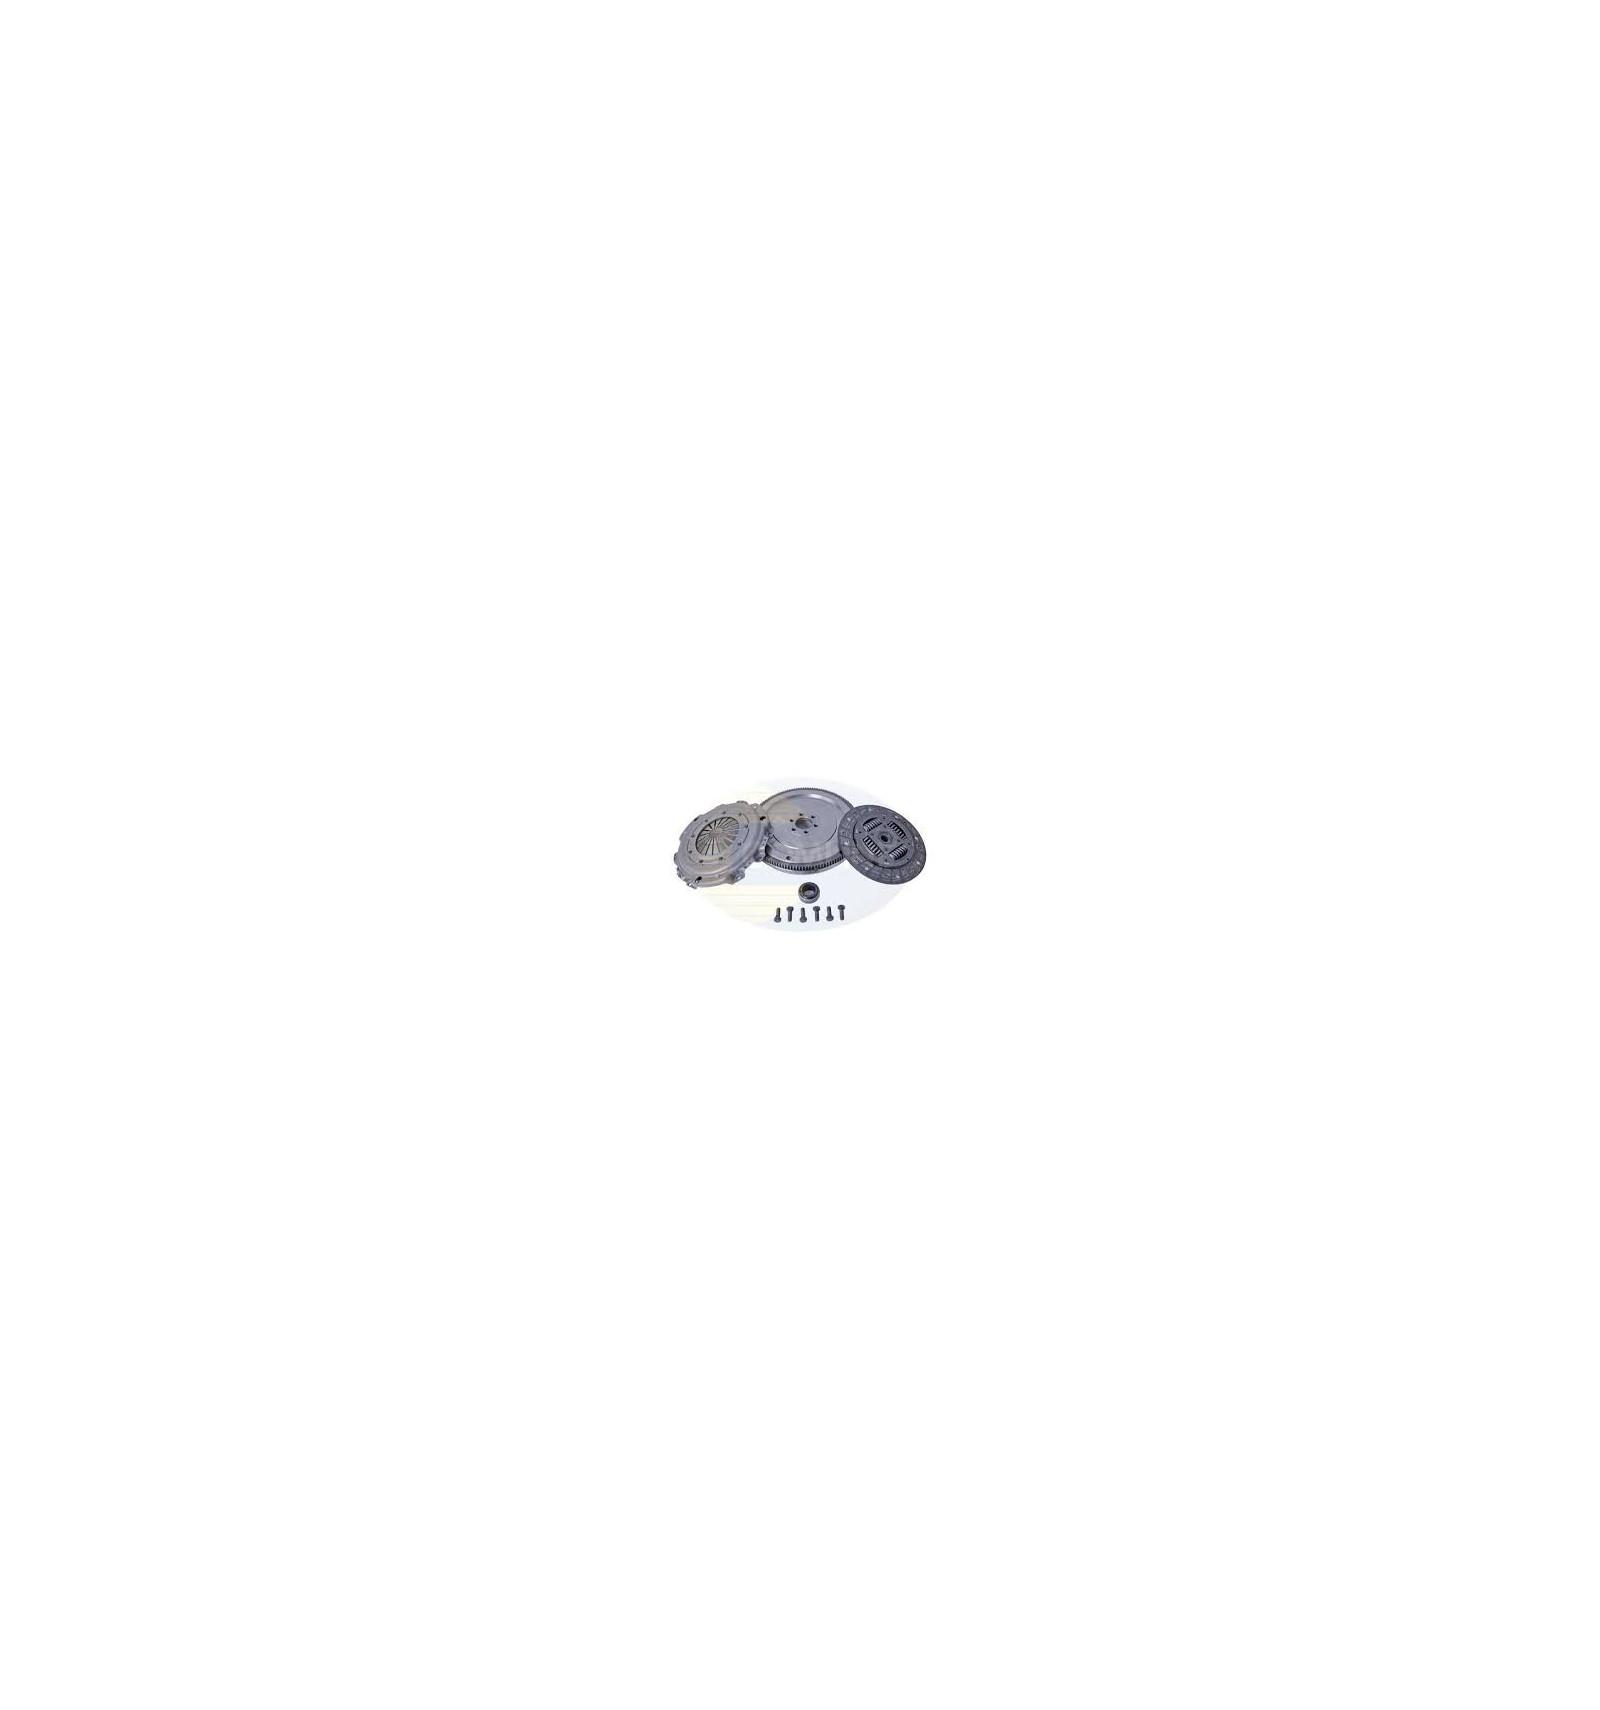 kit d embrayage volant moteur citroen c3 xsara picasso c4 c5 peugeot 206 307 407 1 6 hdi. Black Bedroom Furniture Sets. Home Design Ideas